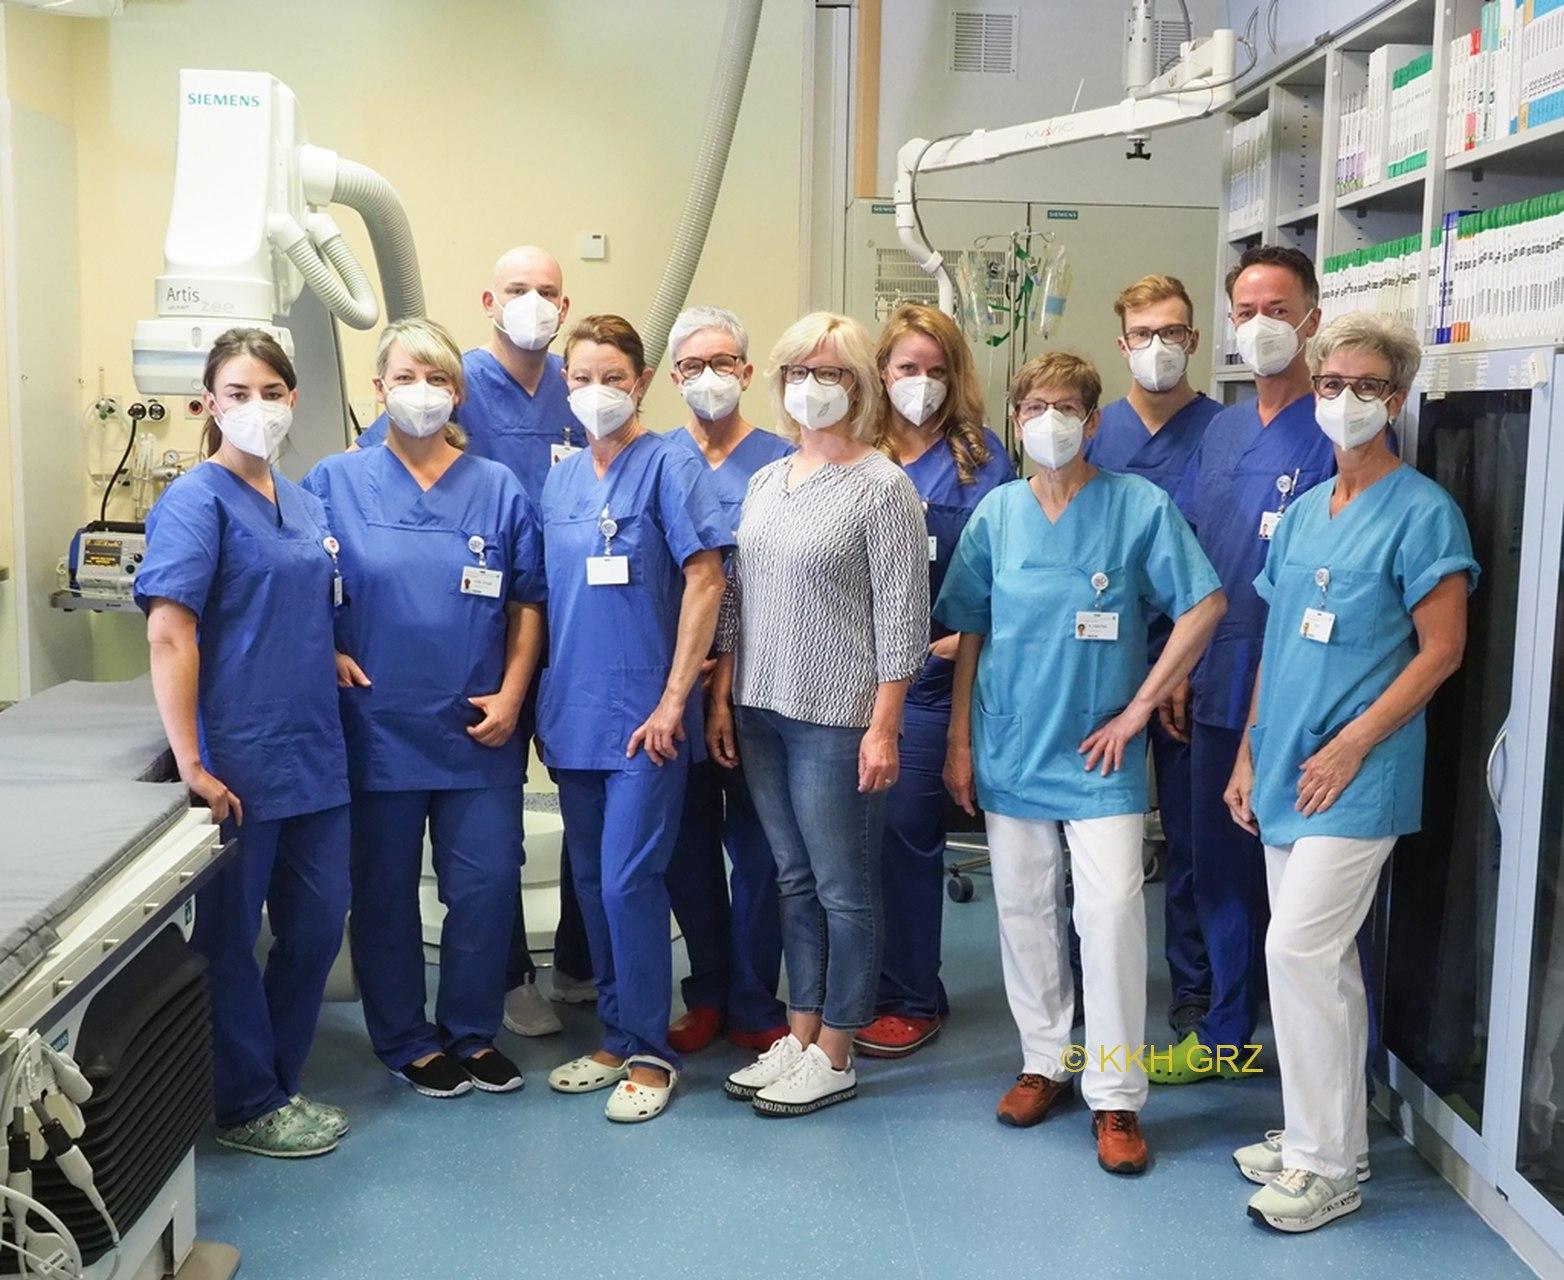 Neuer Herzkathetermessplatz im KKH Greiz